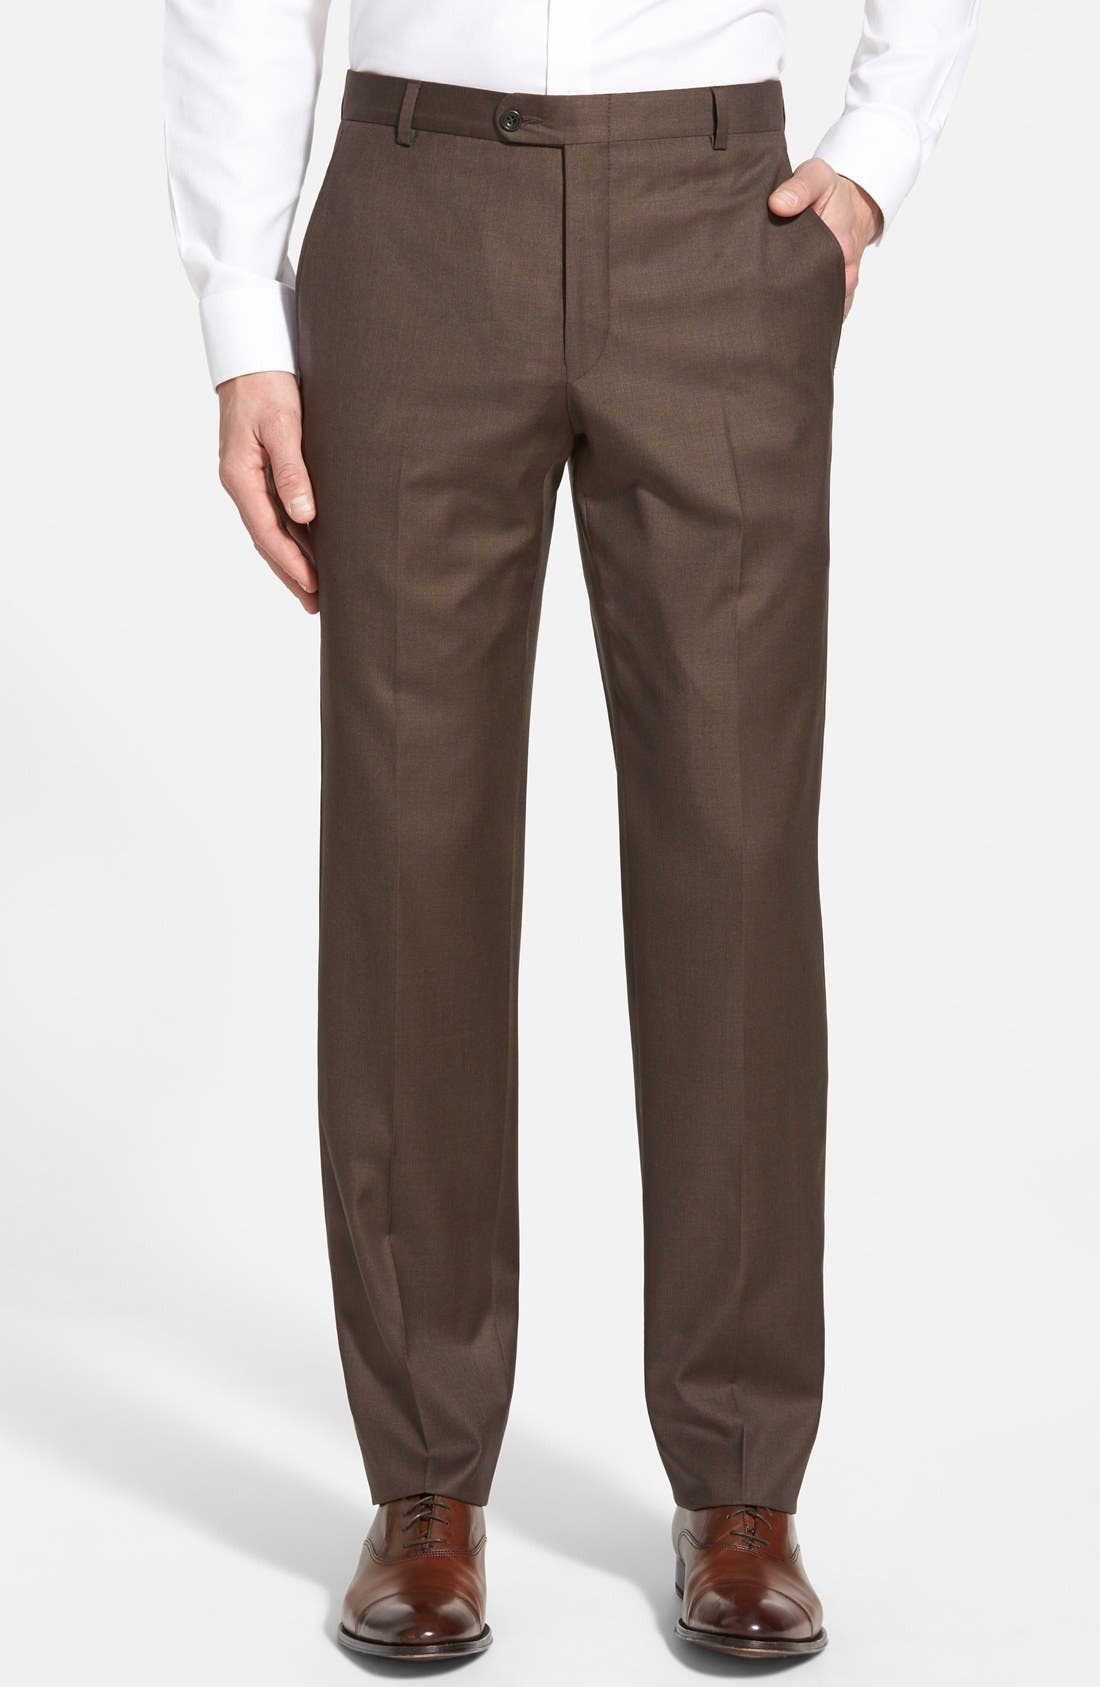 Hickey Freeman 'B Series' Flat Front Wool Trousers